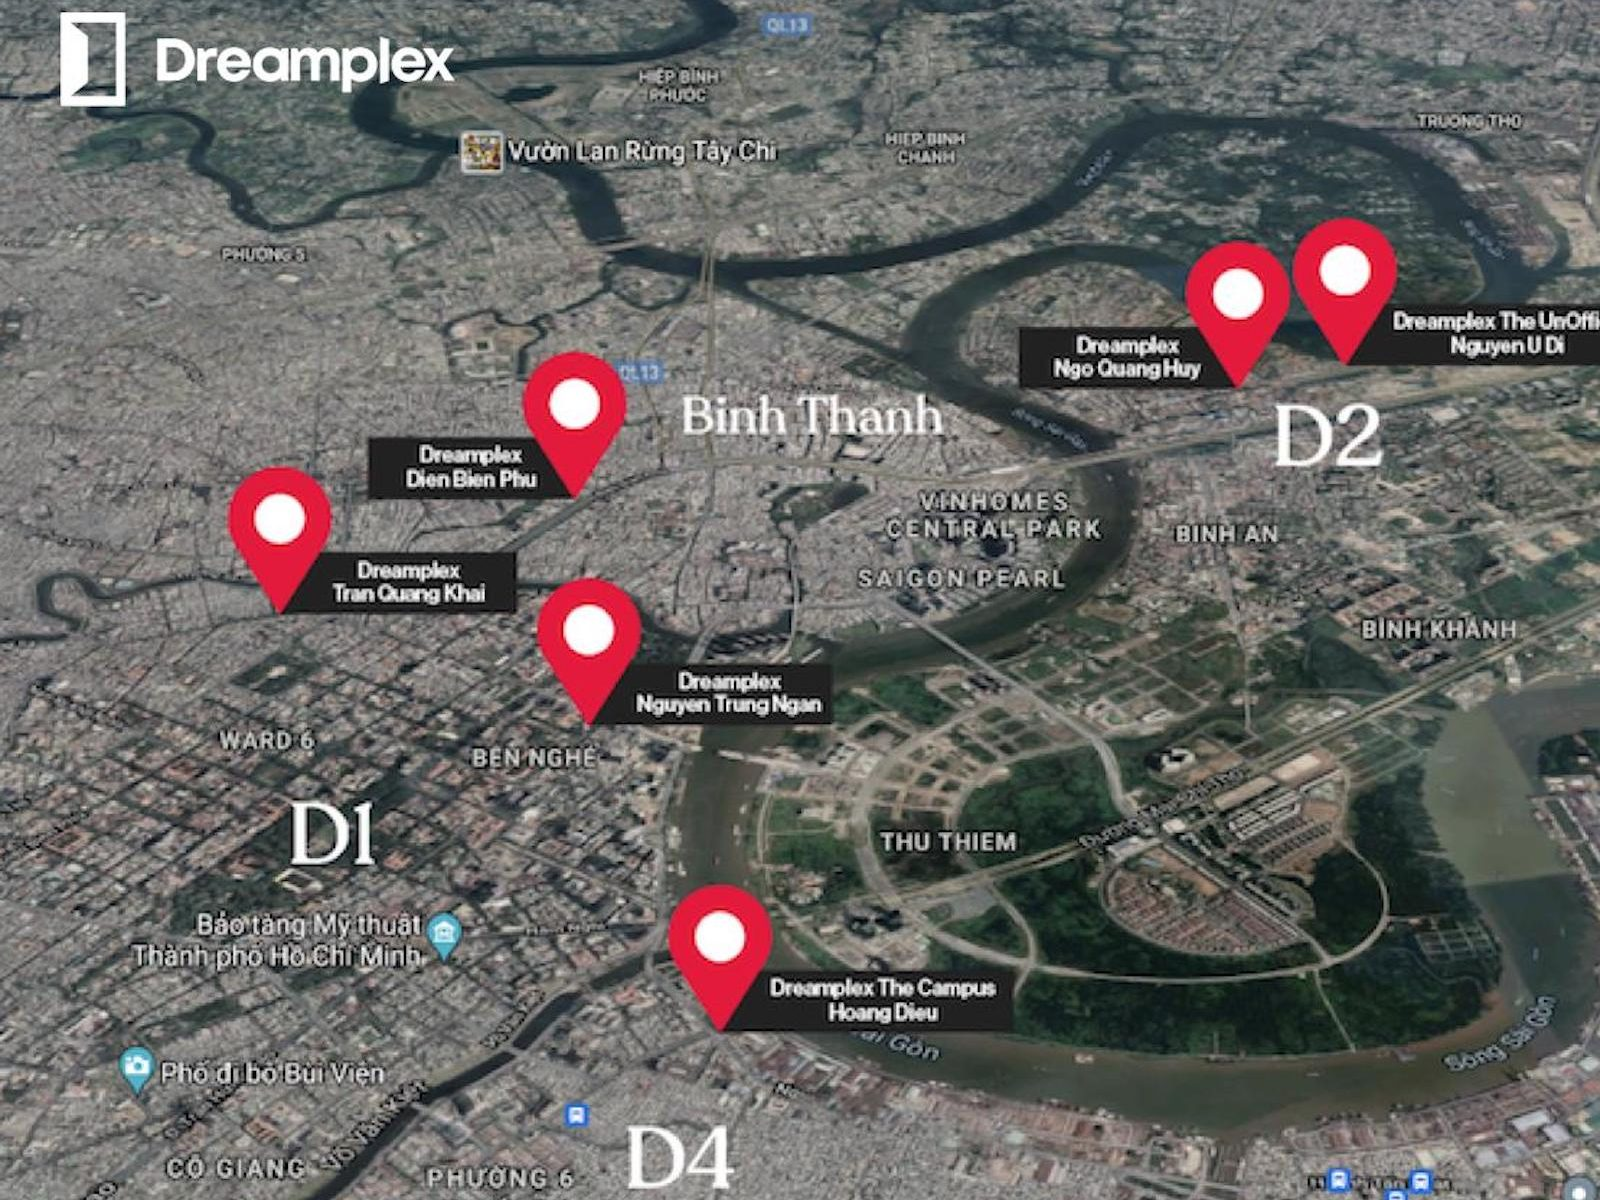 dreamplex-locations